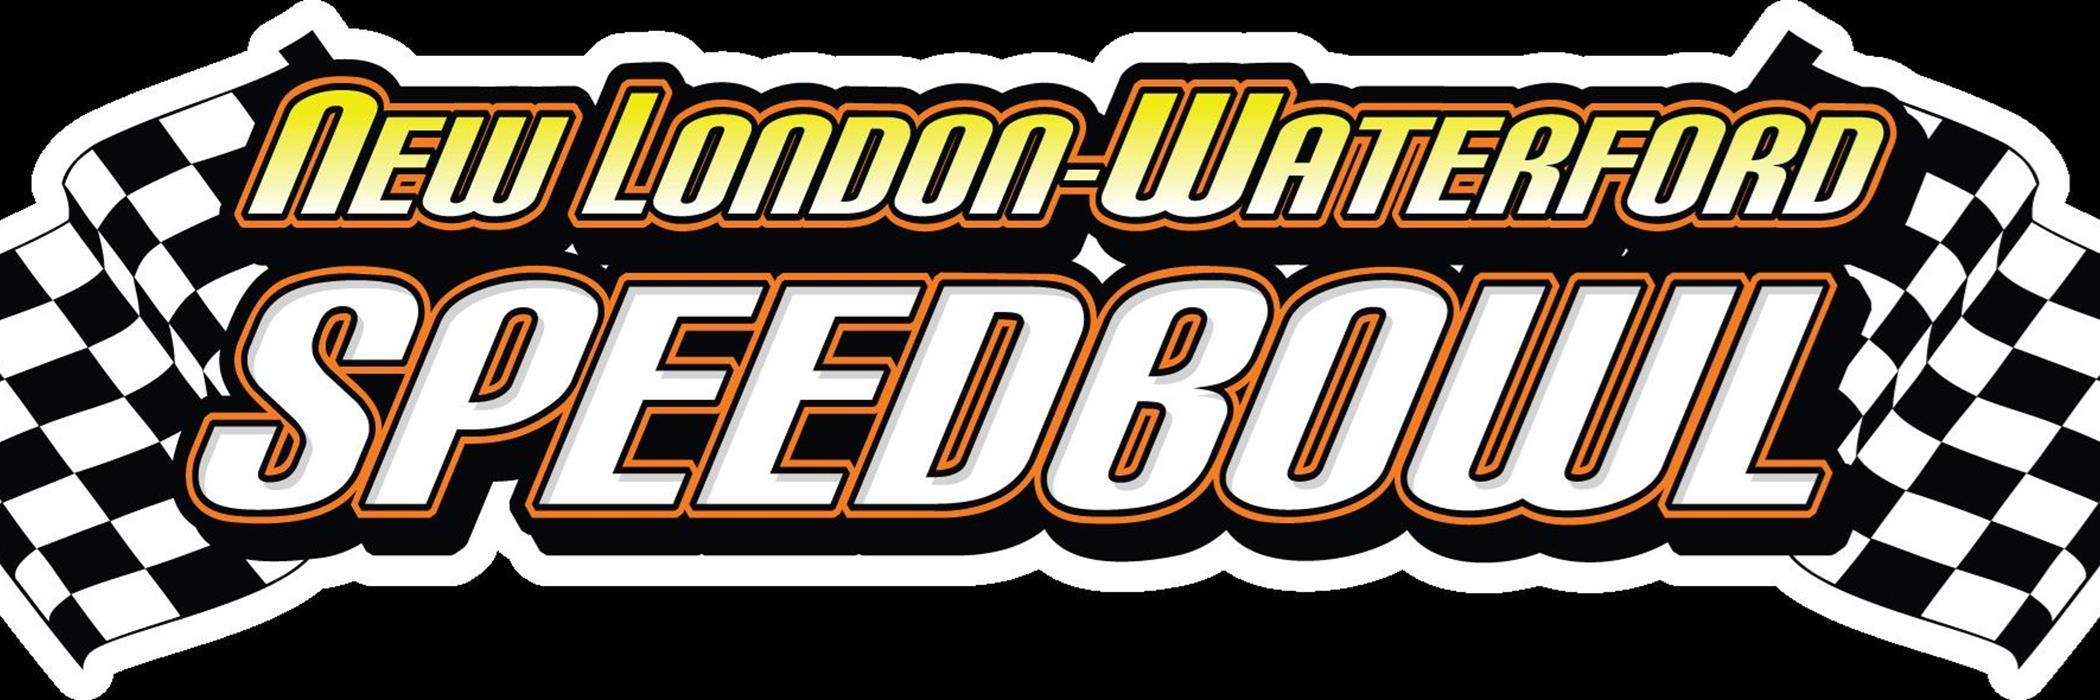 8/28/2021 - Waterford Speedbowl